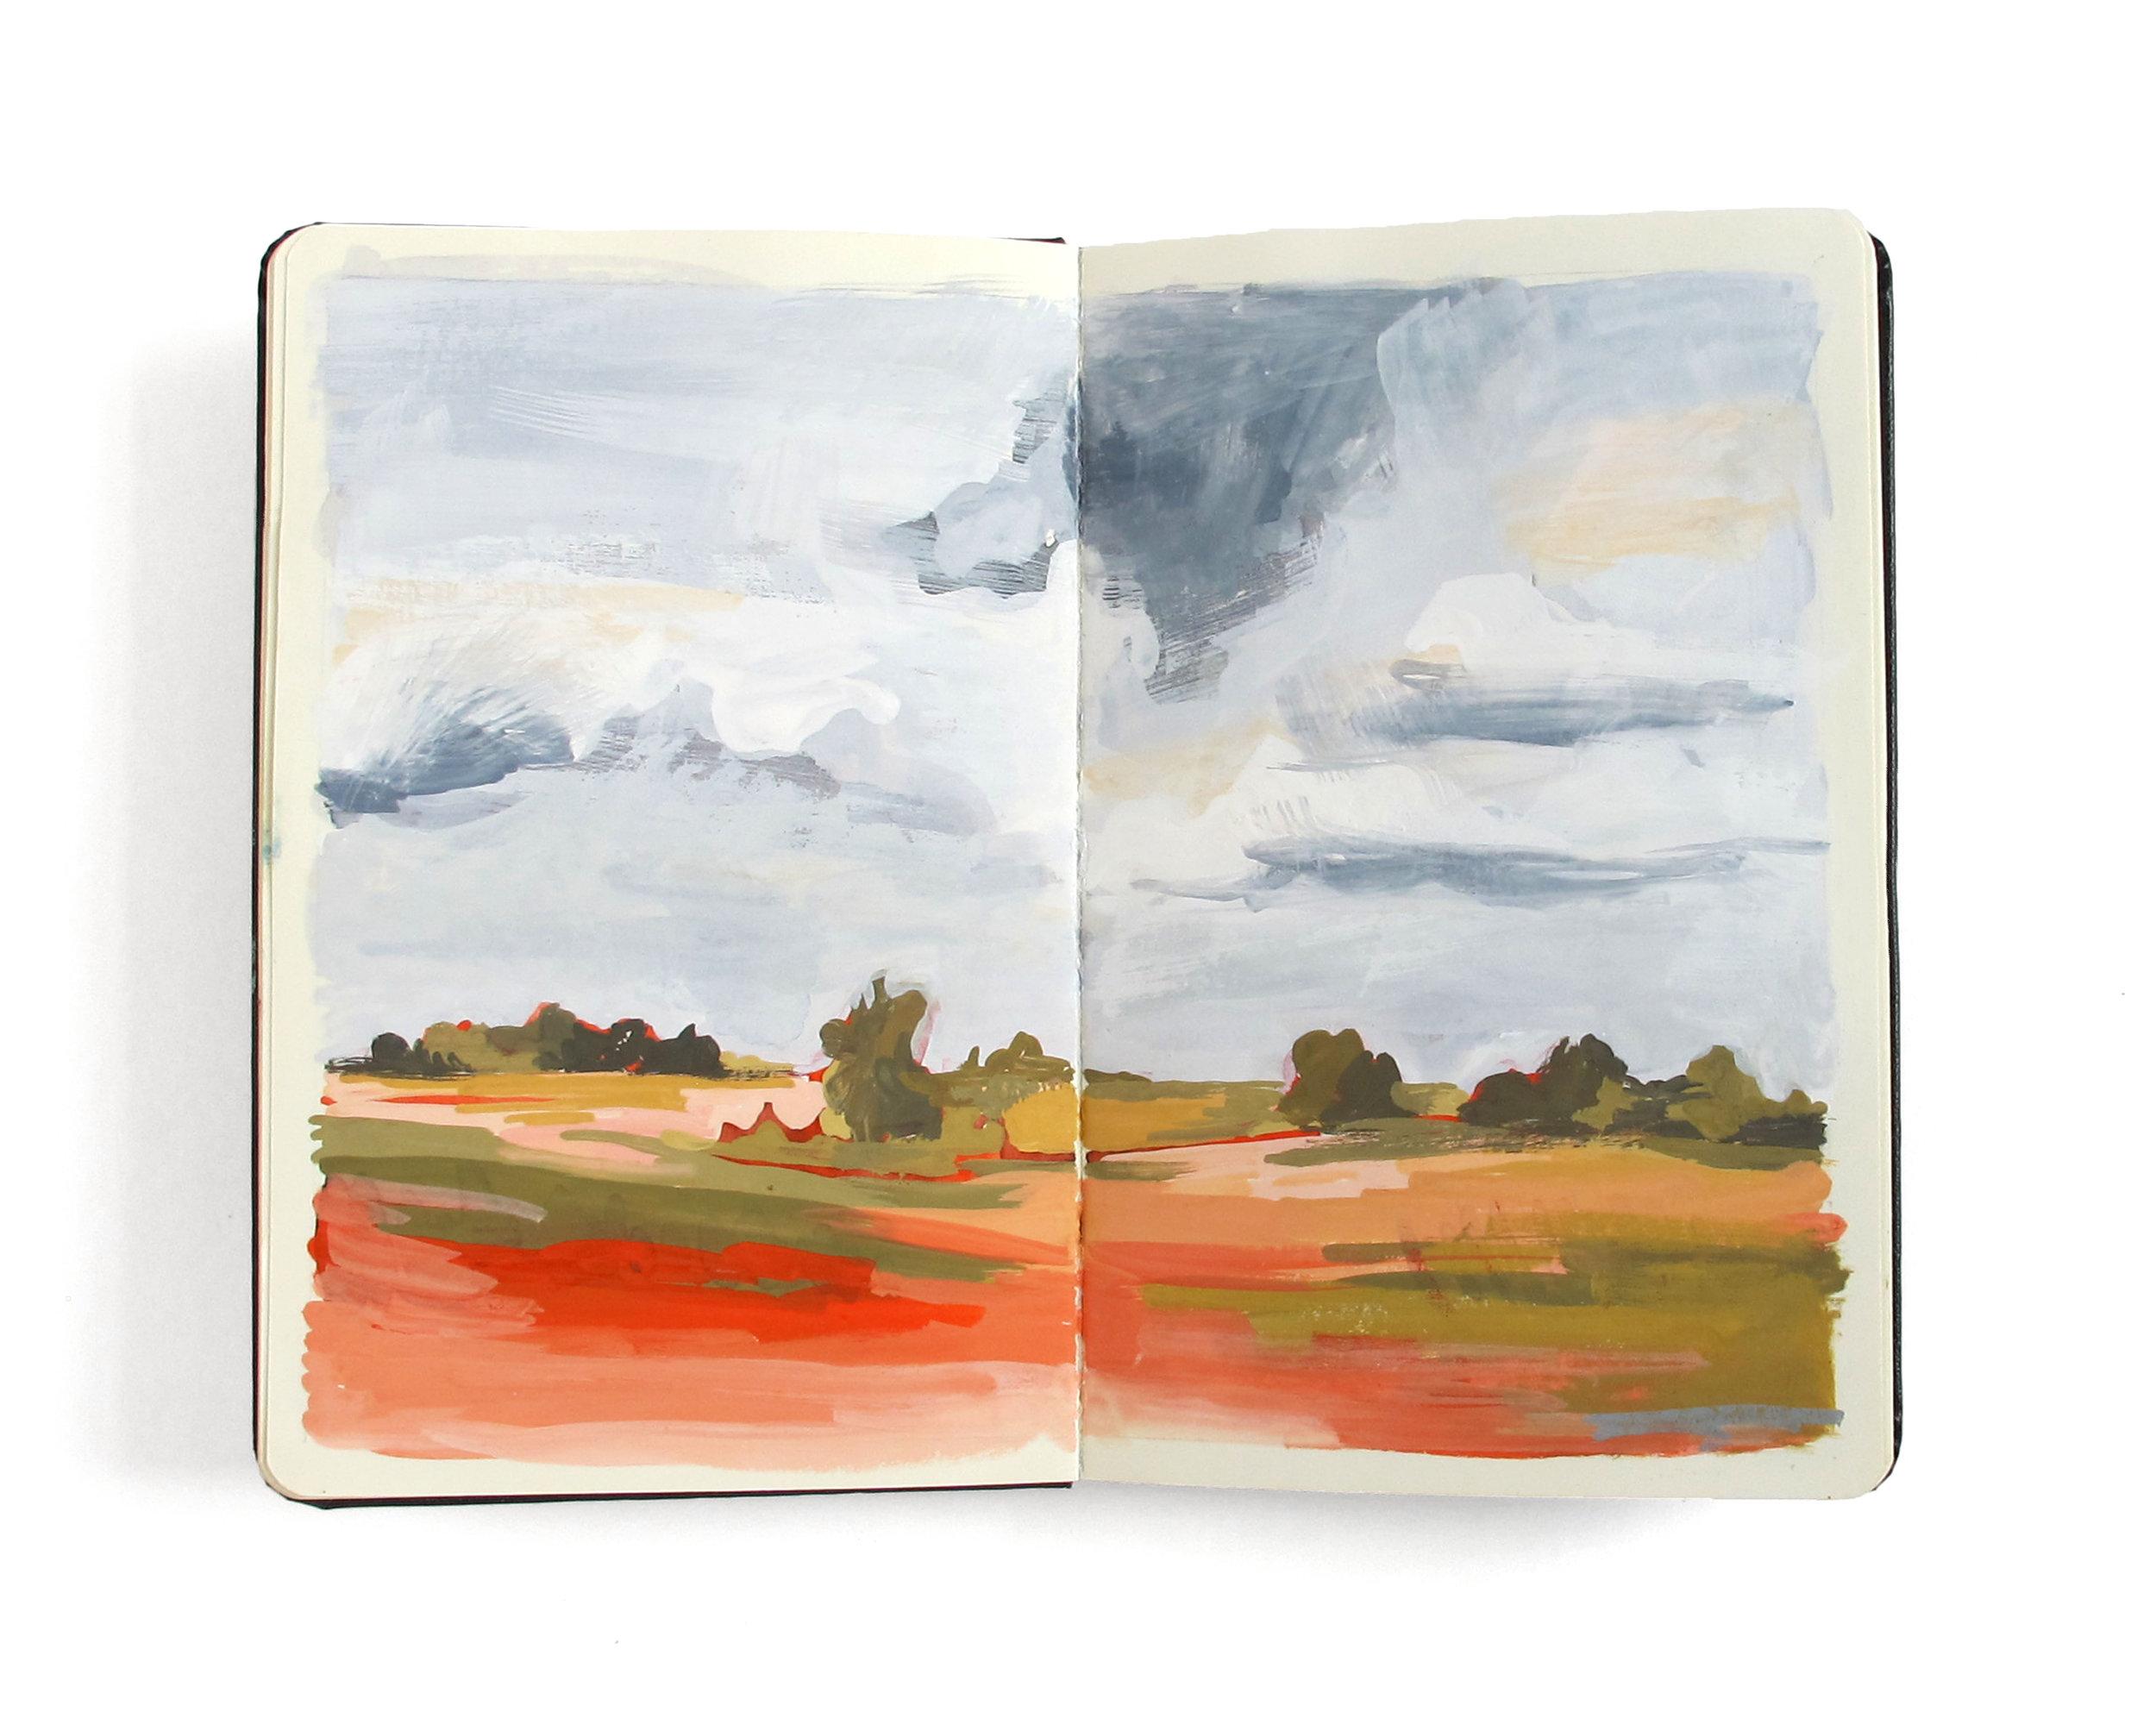 carrie-shryock-painting-landscape.jpg